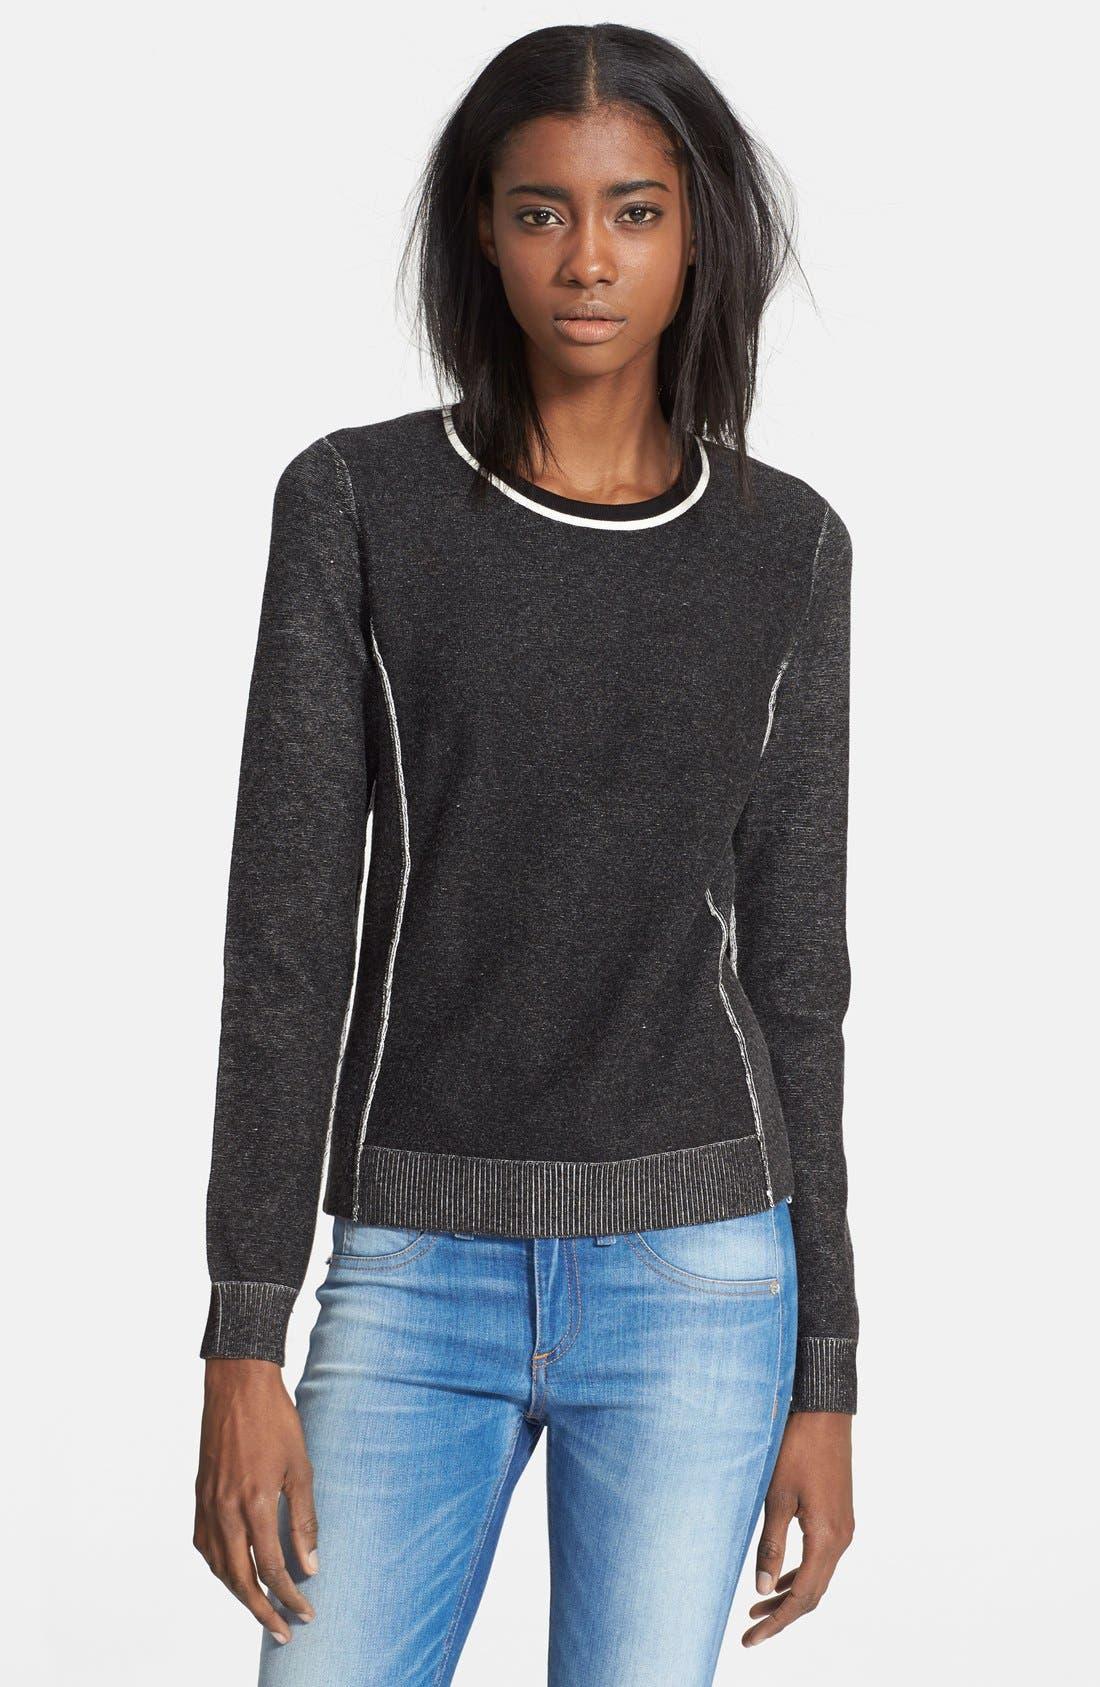 Alternate Image 1 Selected - rag & bone 'Taylor' Sweater